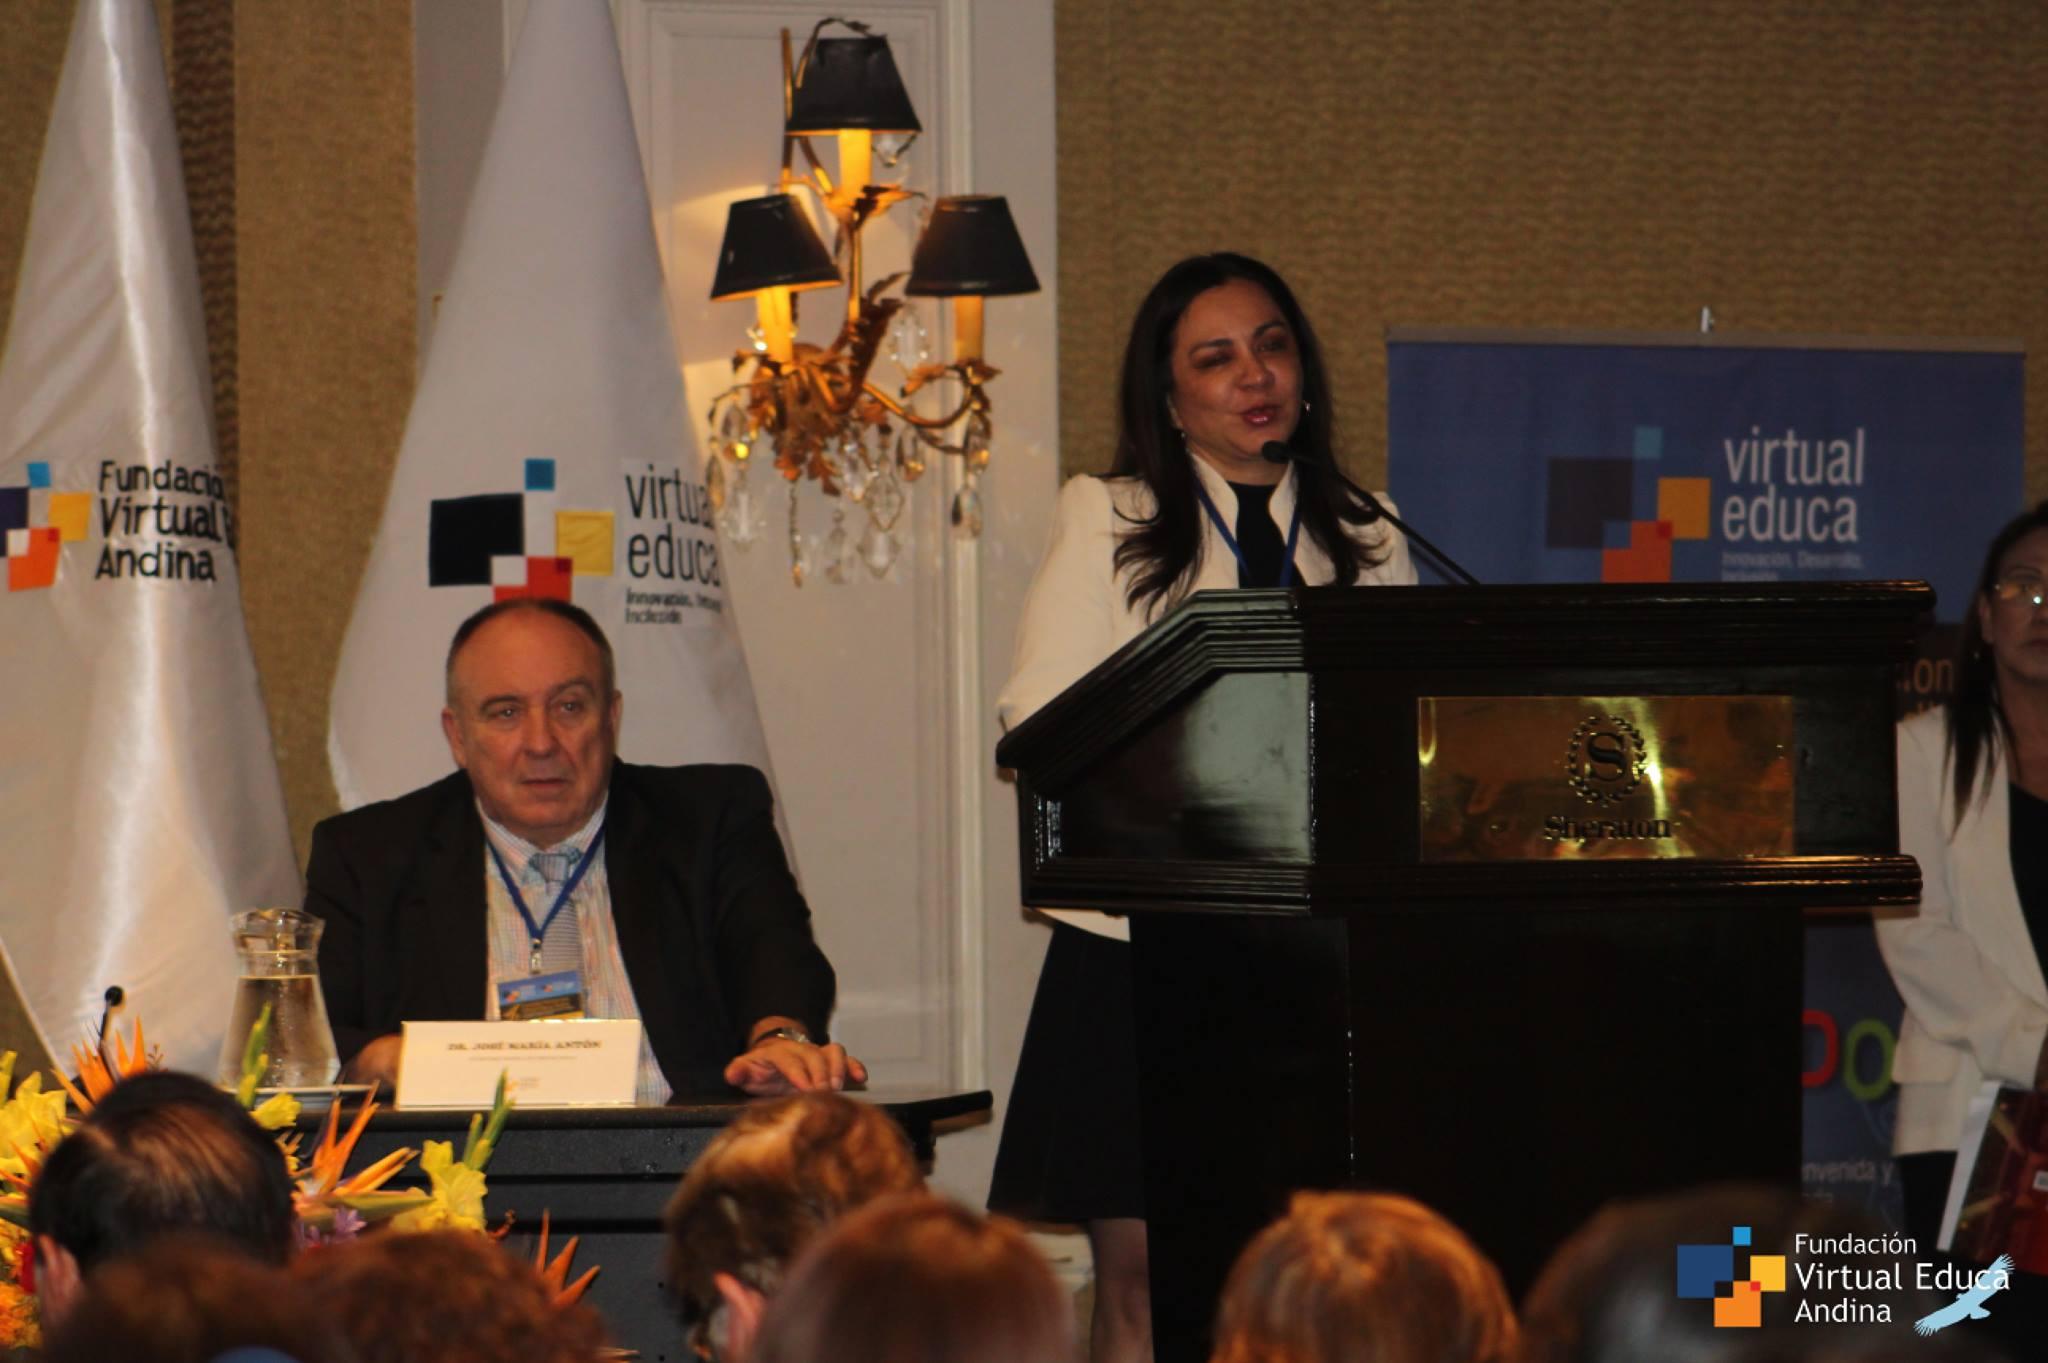 IV Encuentro Internacional Virtual Educa Andina